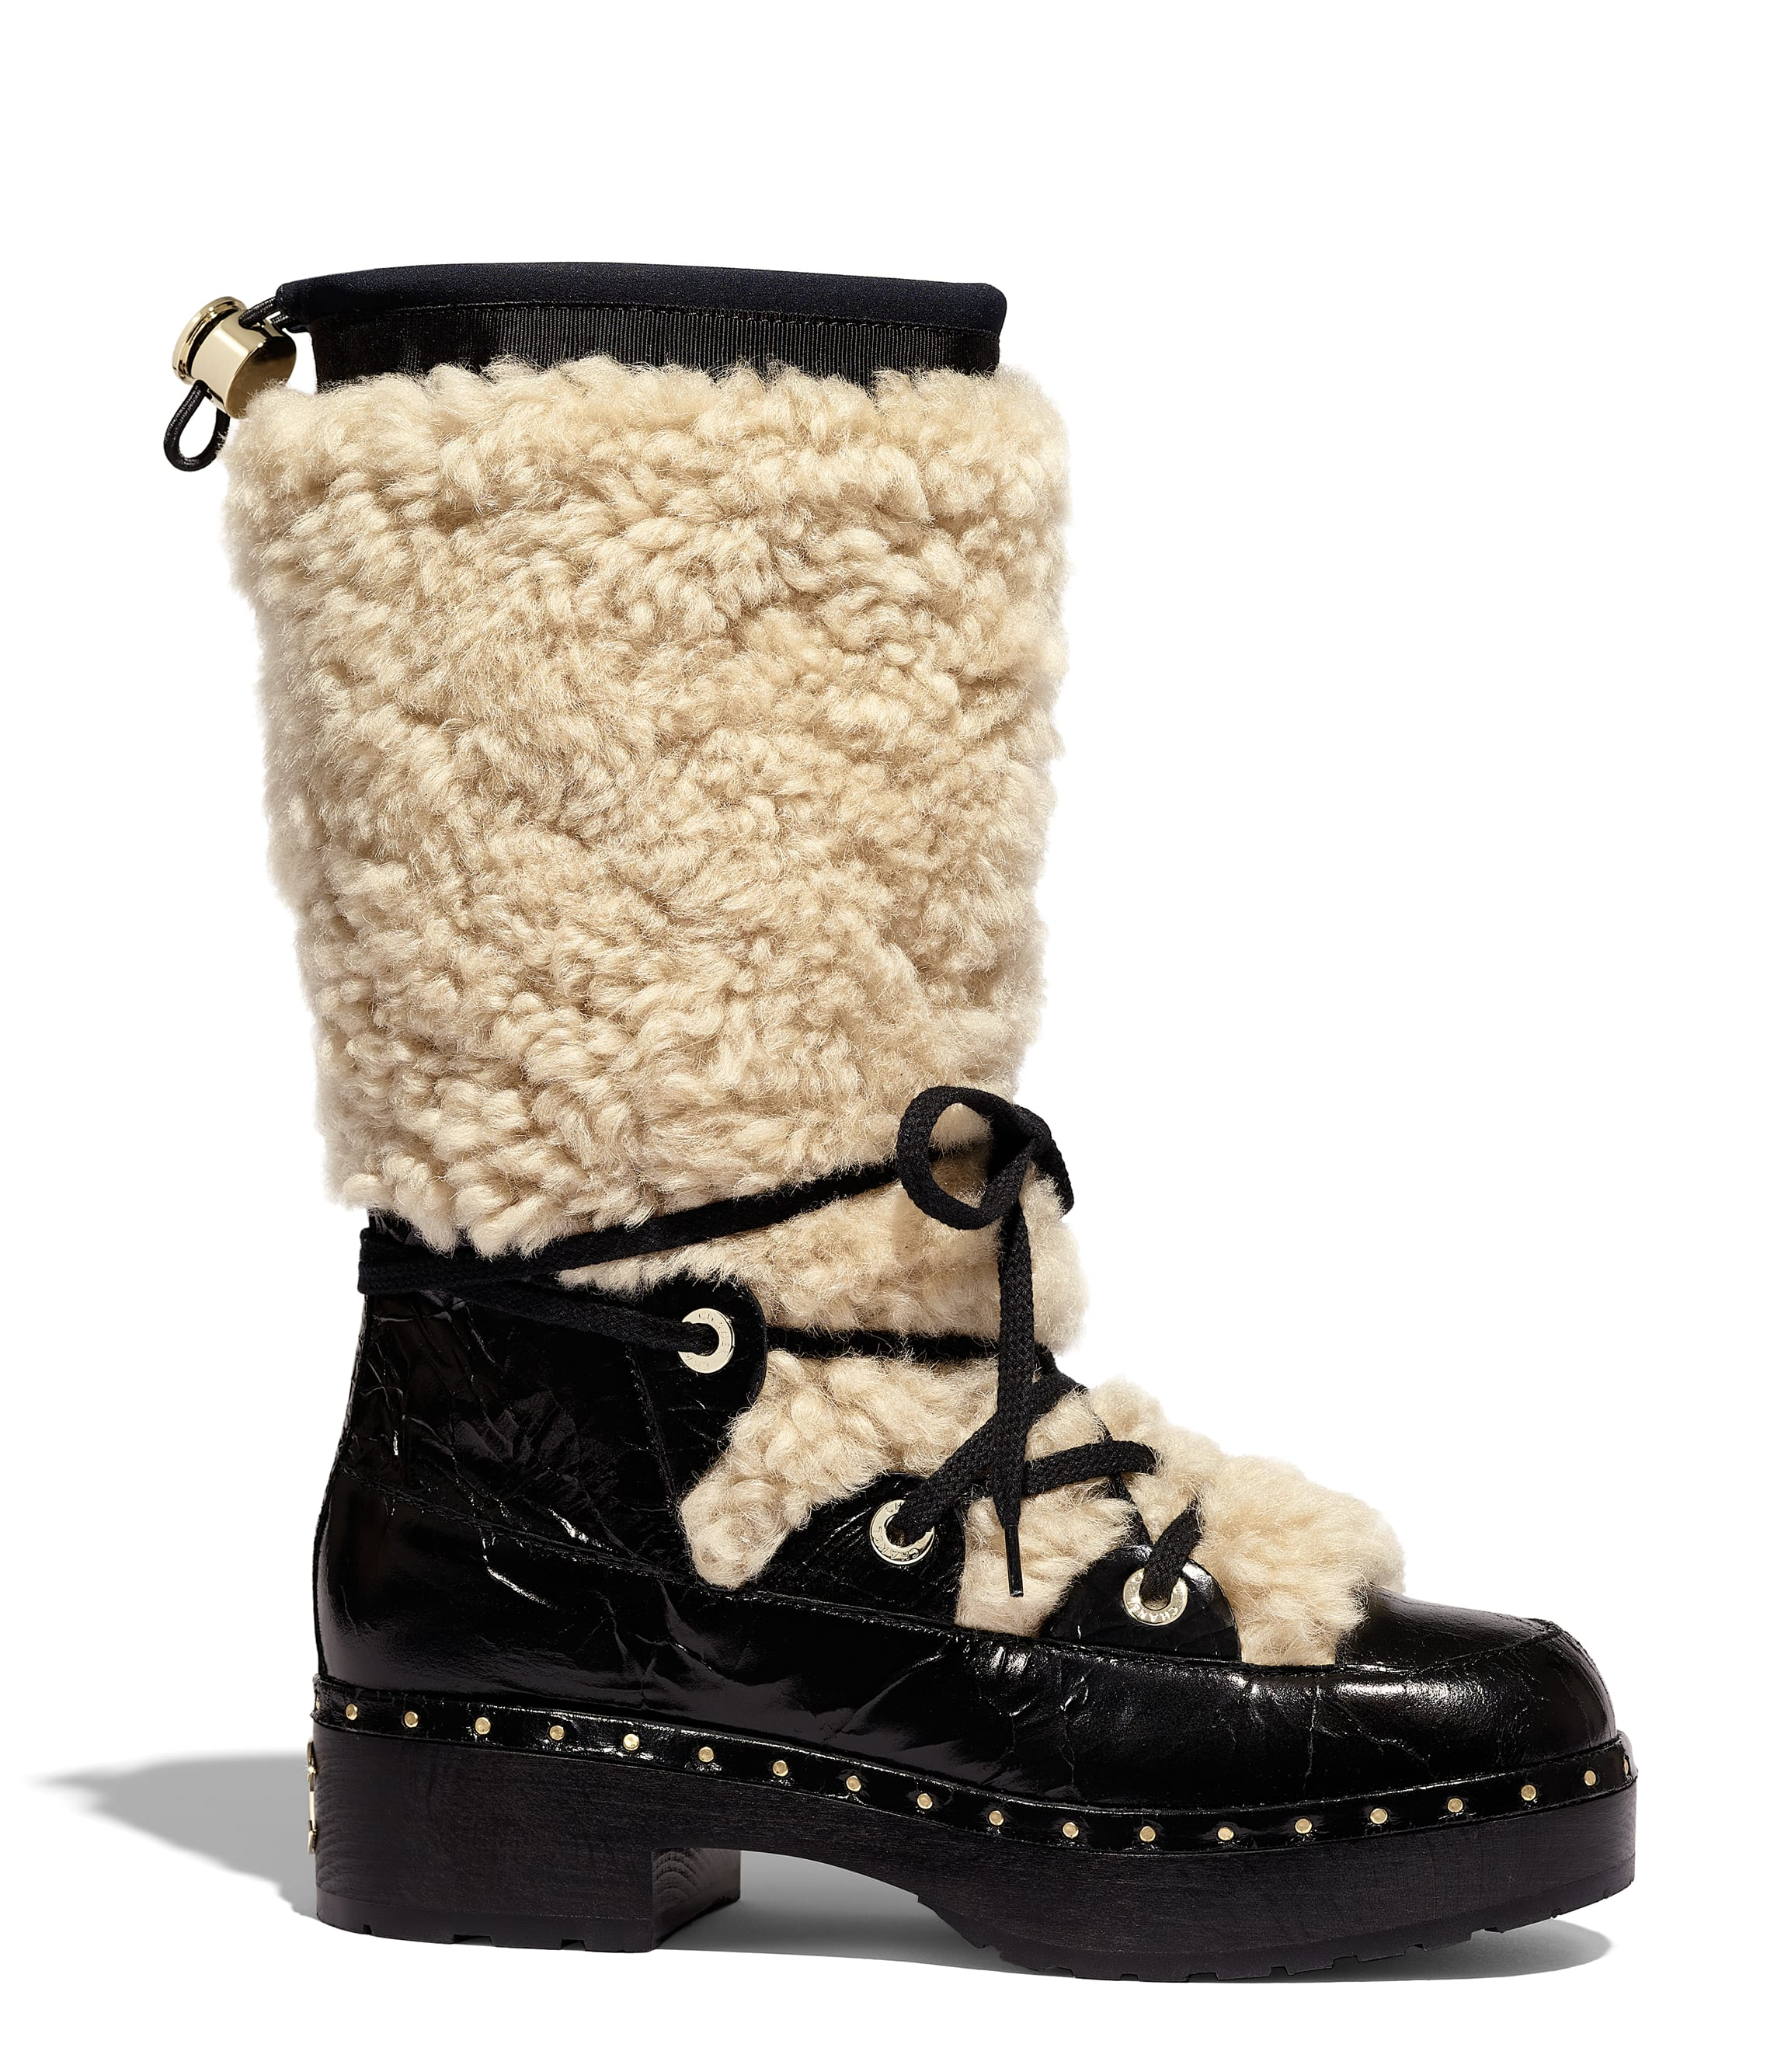 high-boots-beige-black-shearling-crackled-sheepskin-shearling-crackled-sheepskin-packshot-default-g35157y53513c0204-8819825573918